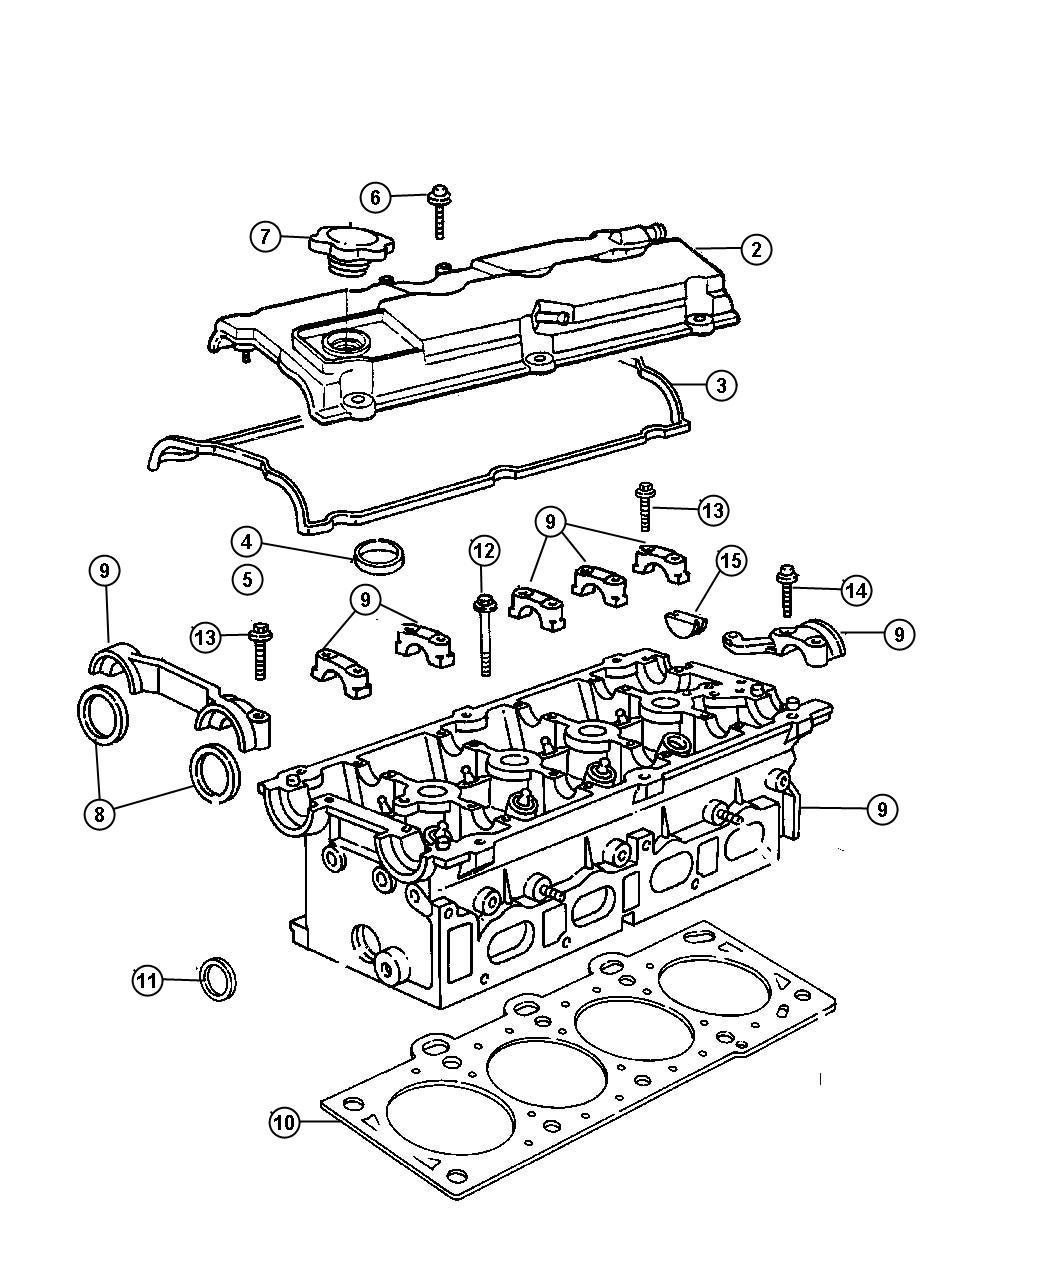 2004 Dodge Stratus Gasket  Cylinder Head Cover  Valve